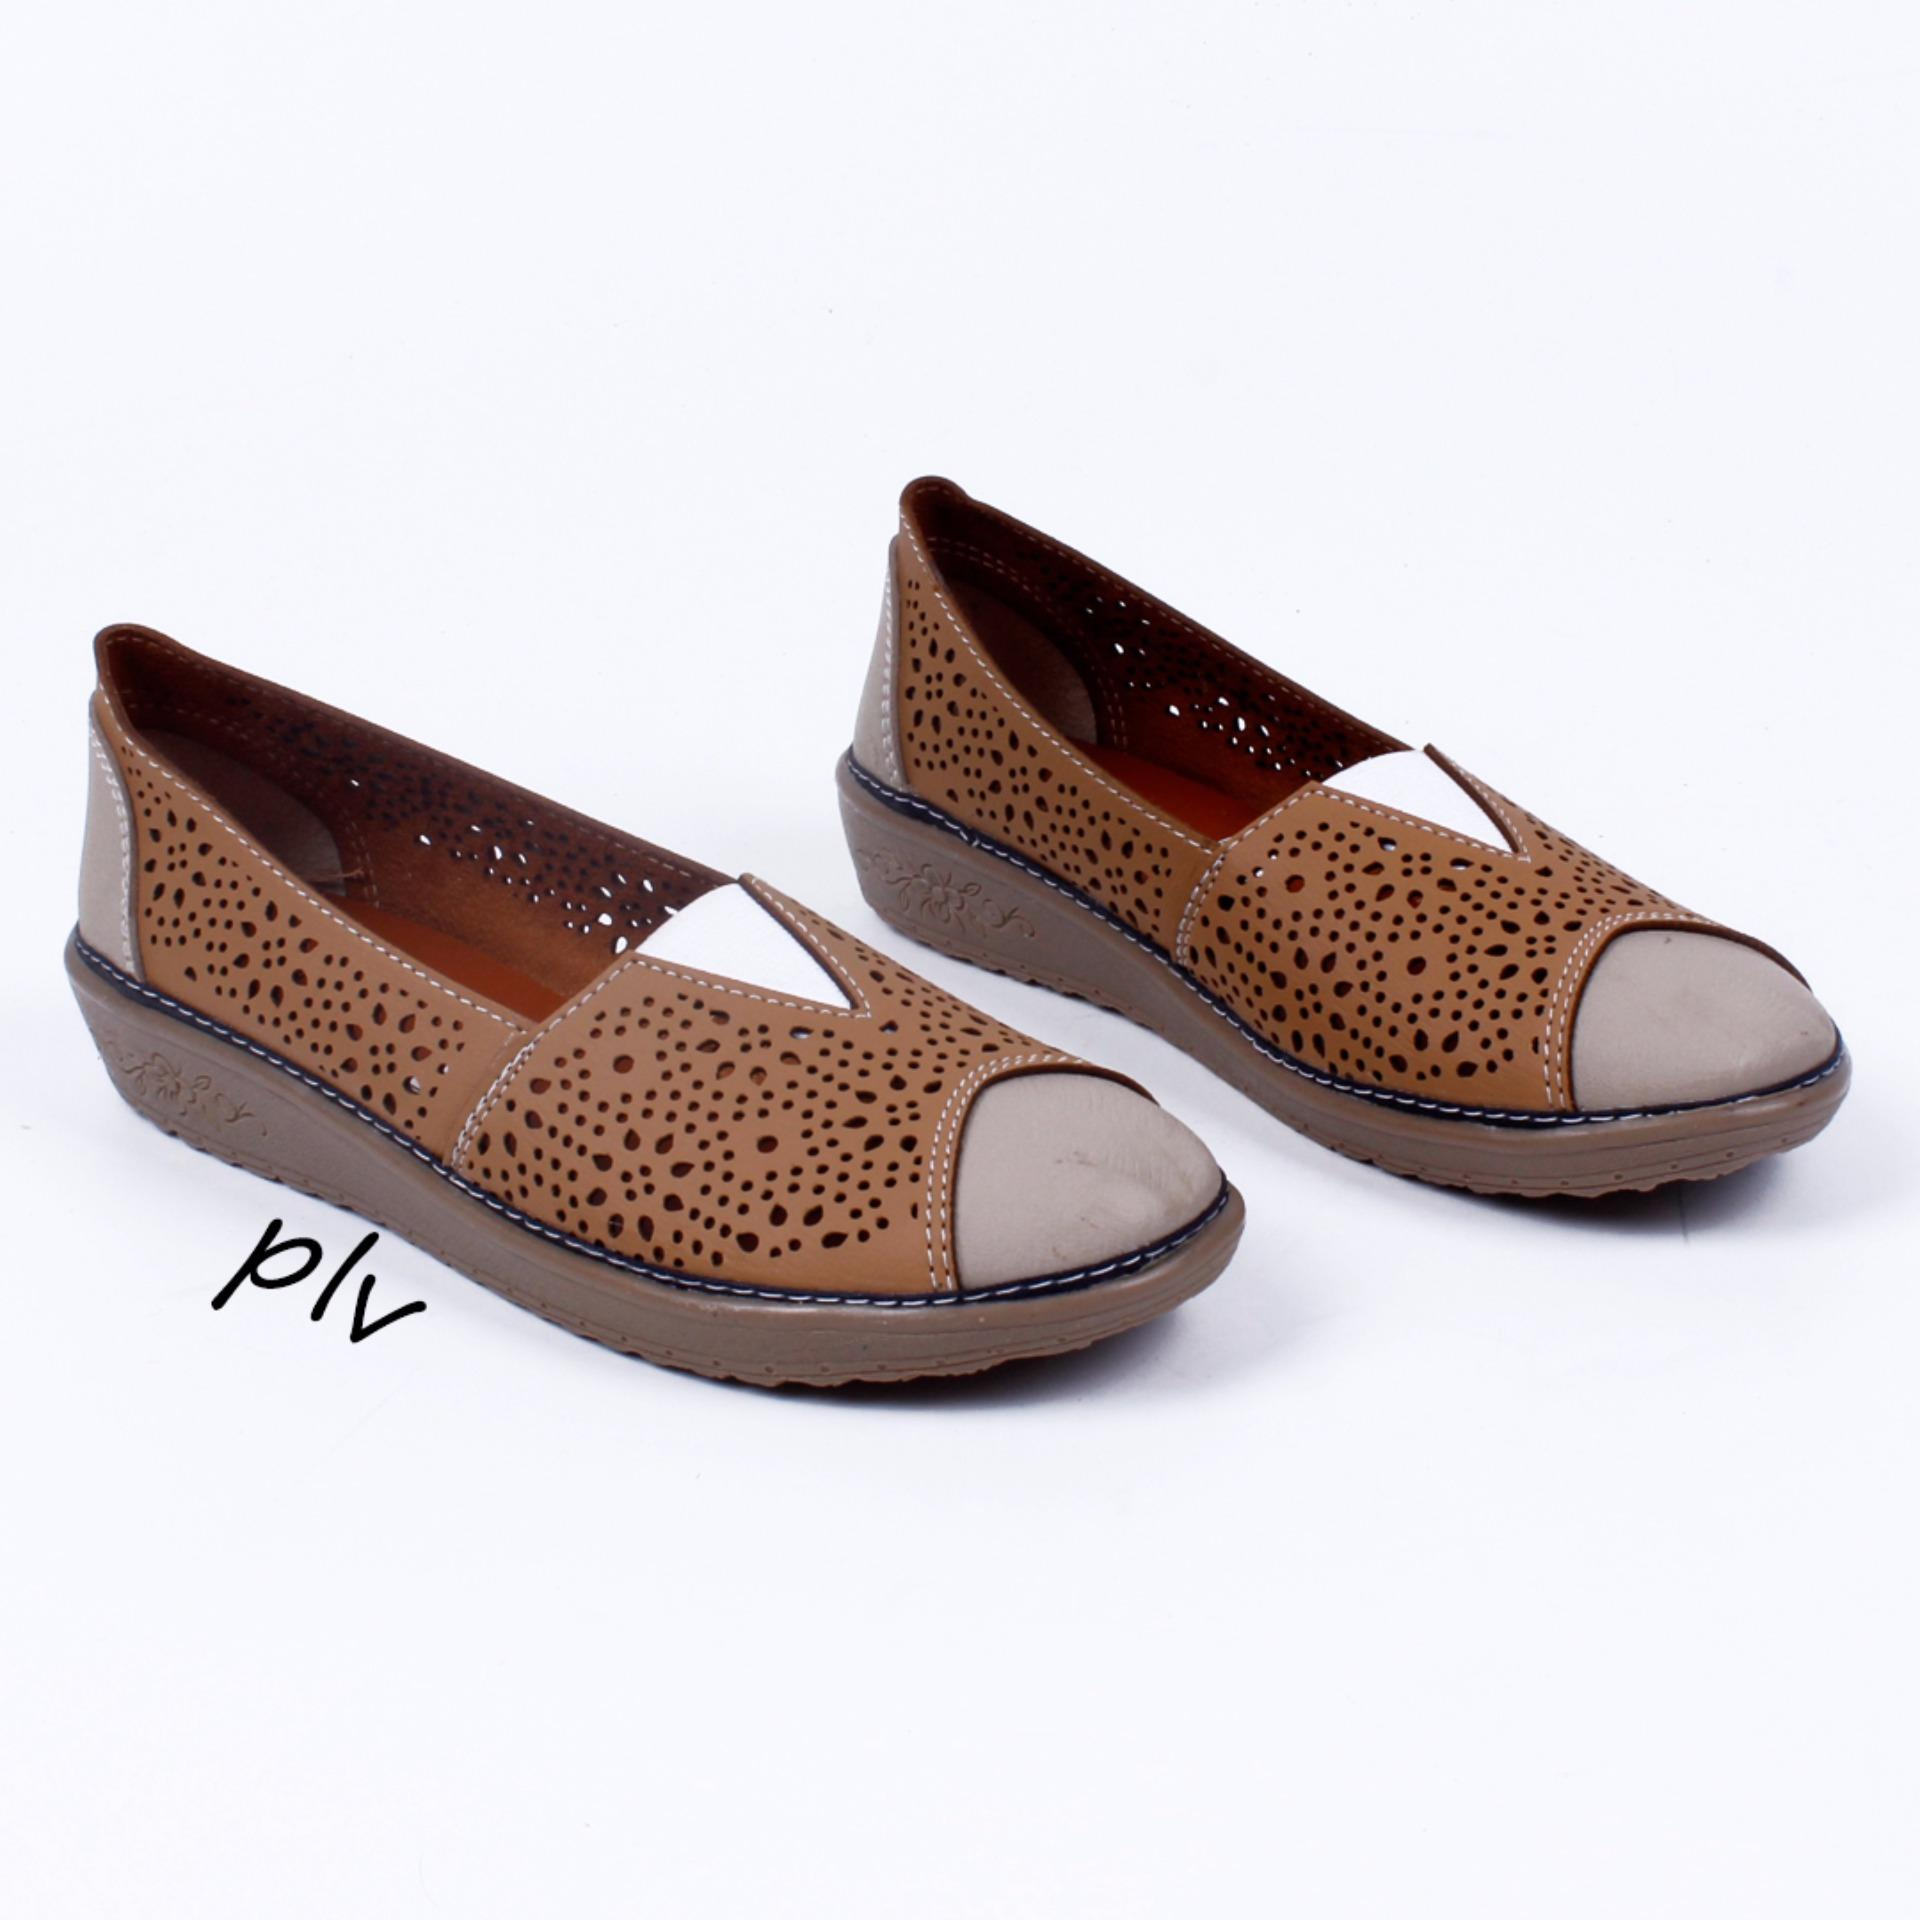 Promo Grivera Sepatu Wanita Flat Shoes Laser My88 Tan Di Indonesia